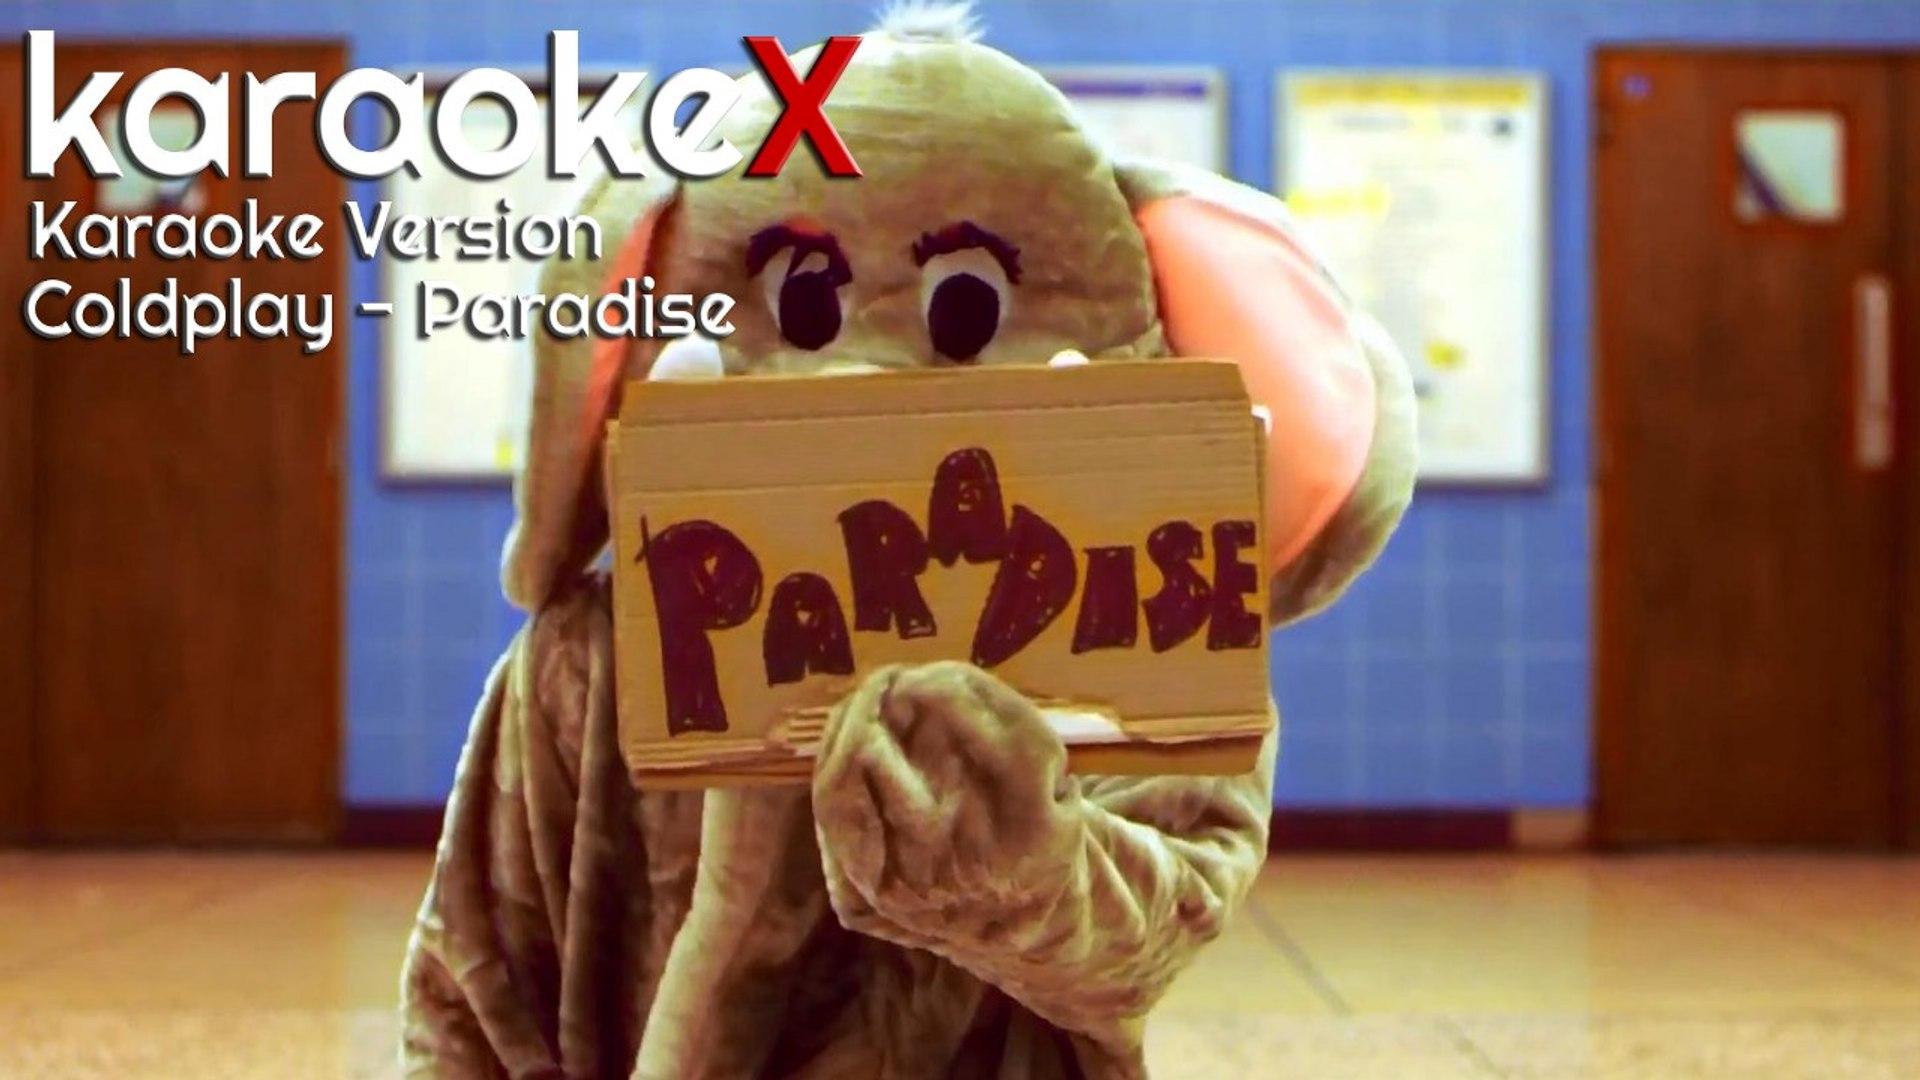 Coldplay - Paradise Karaoke Version (KaraokeX)